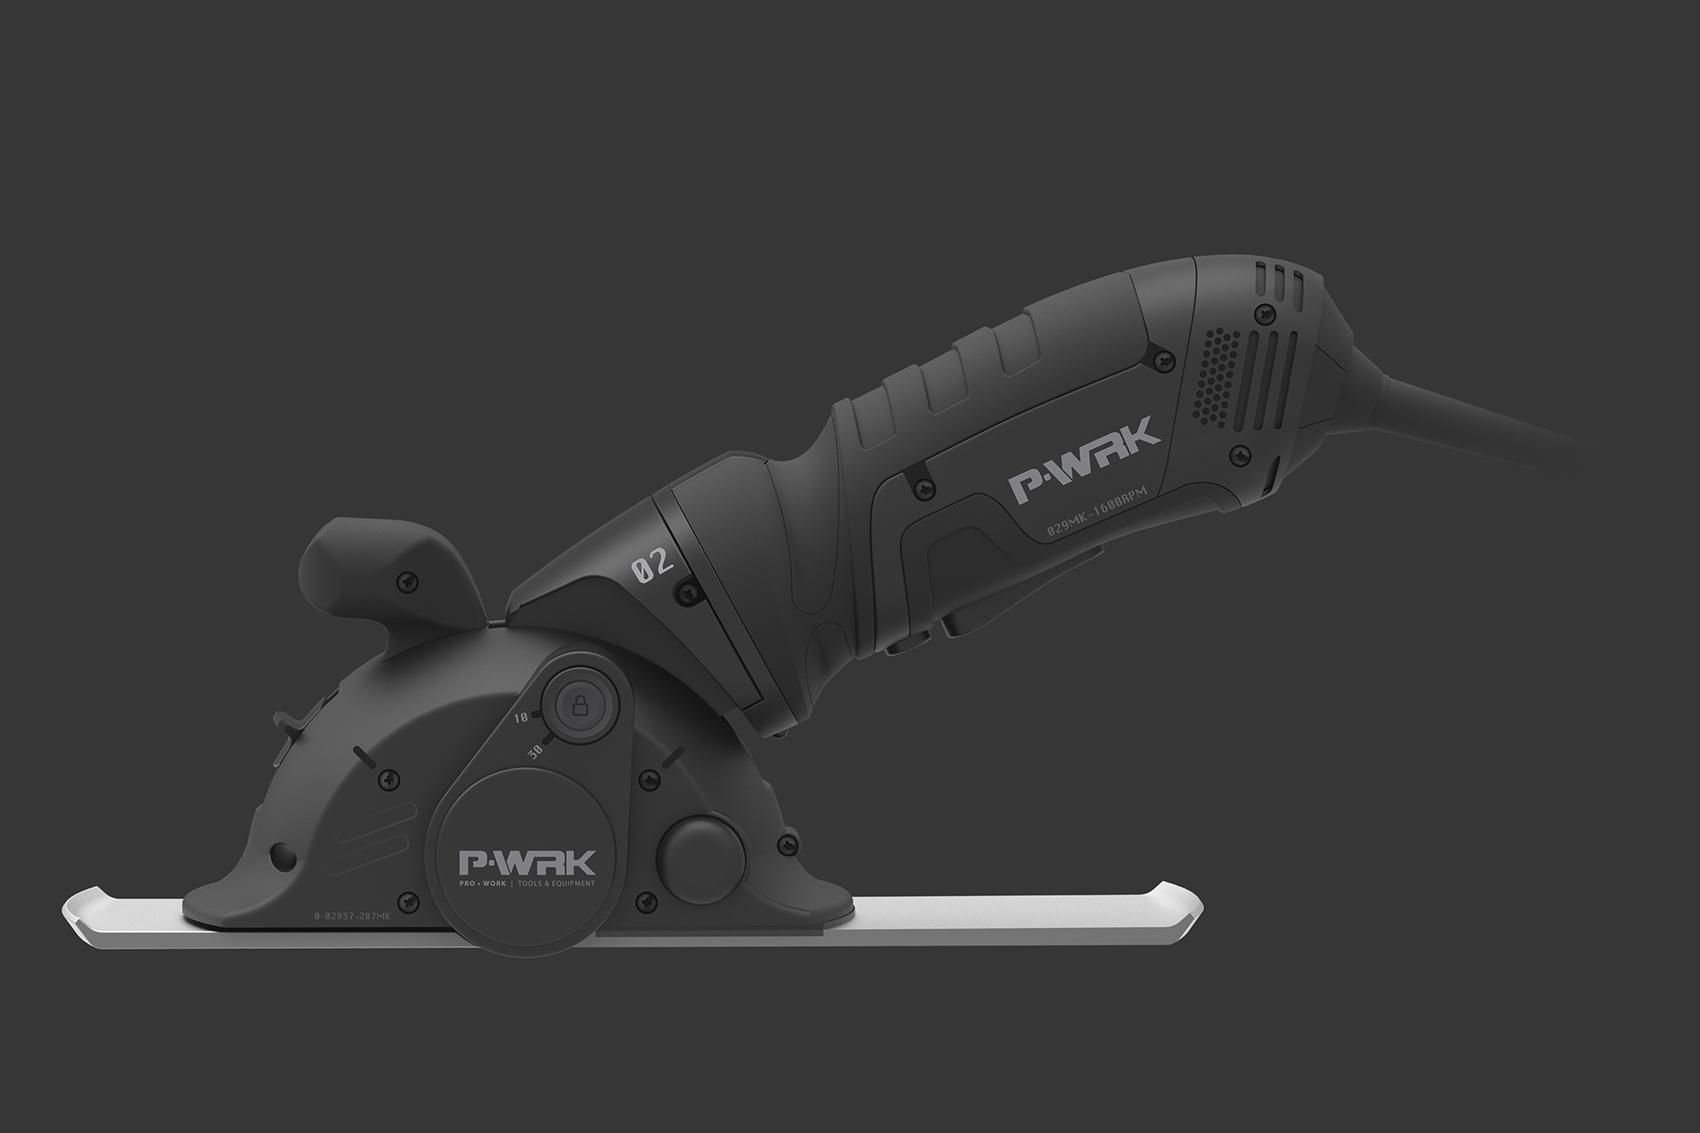 CADwork-Plainer-black-01